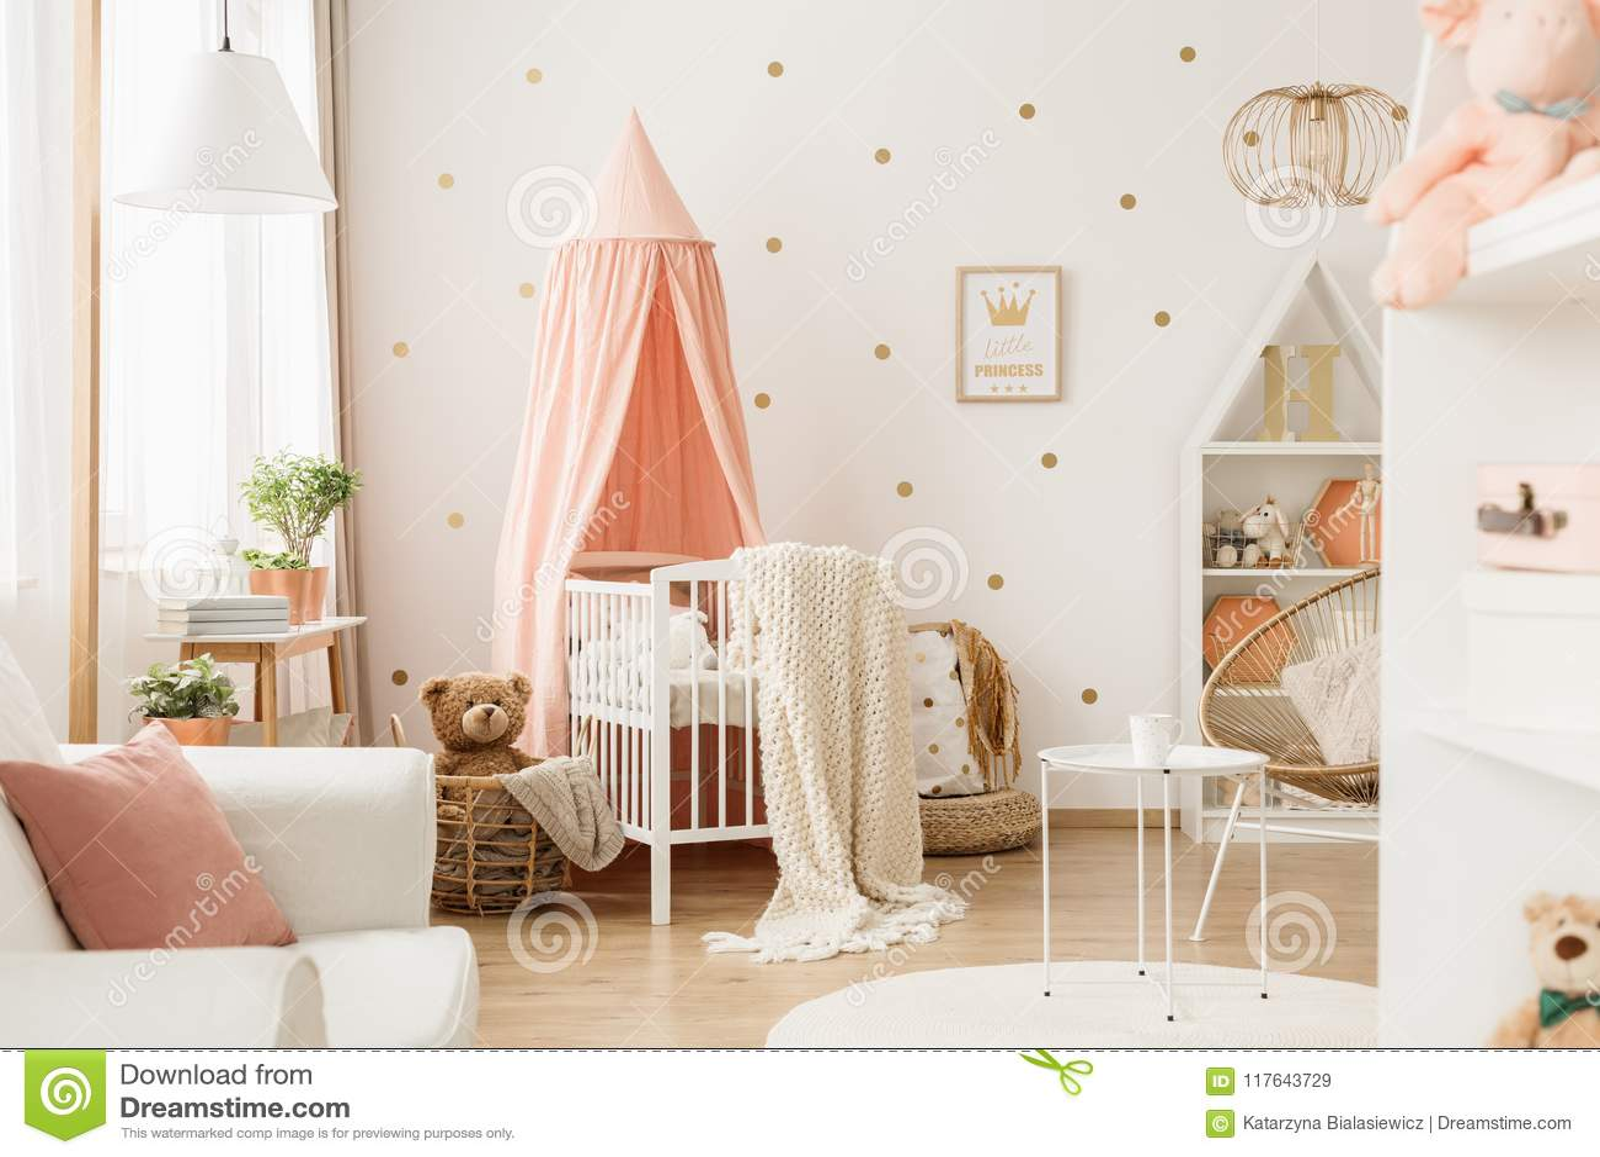 Nursery room with dots